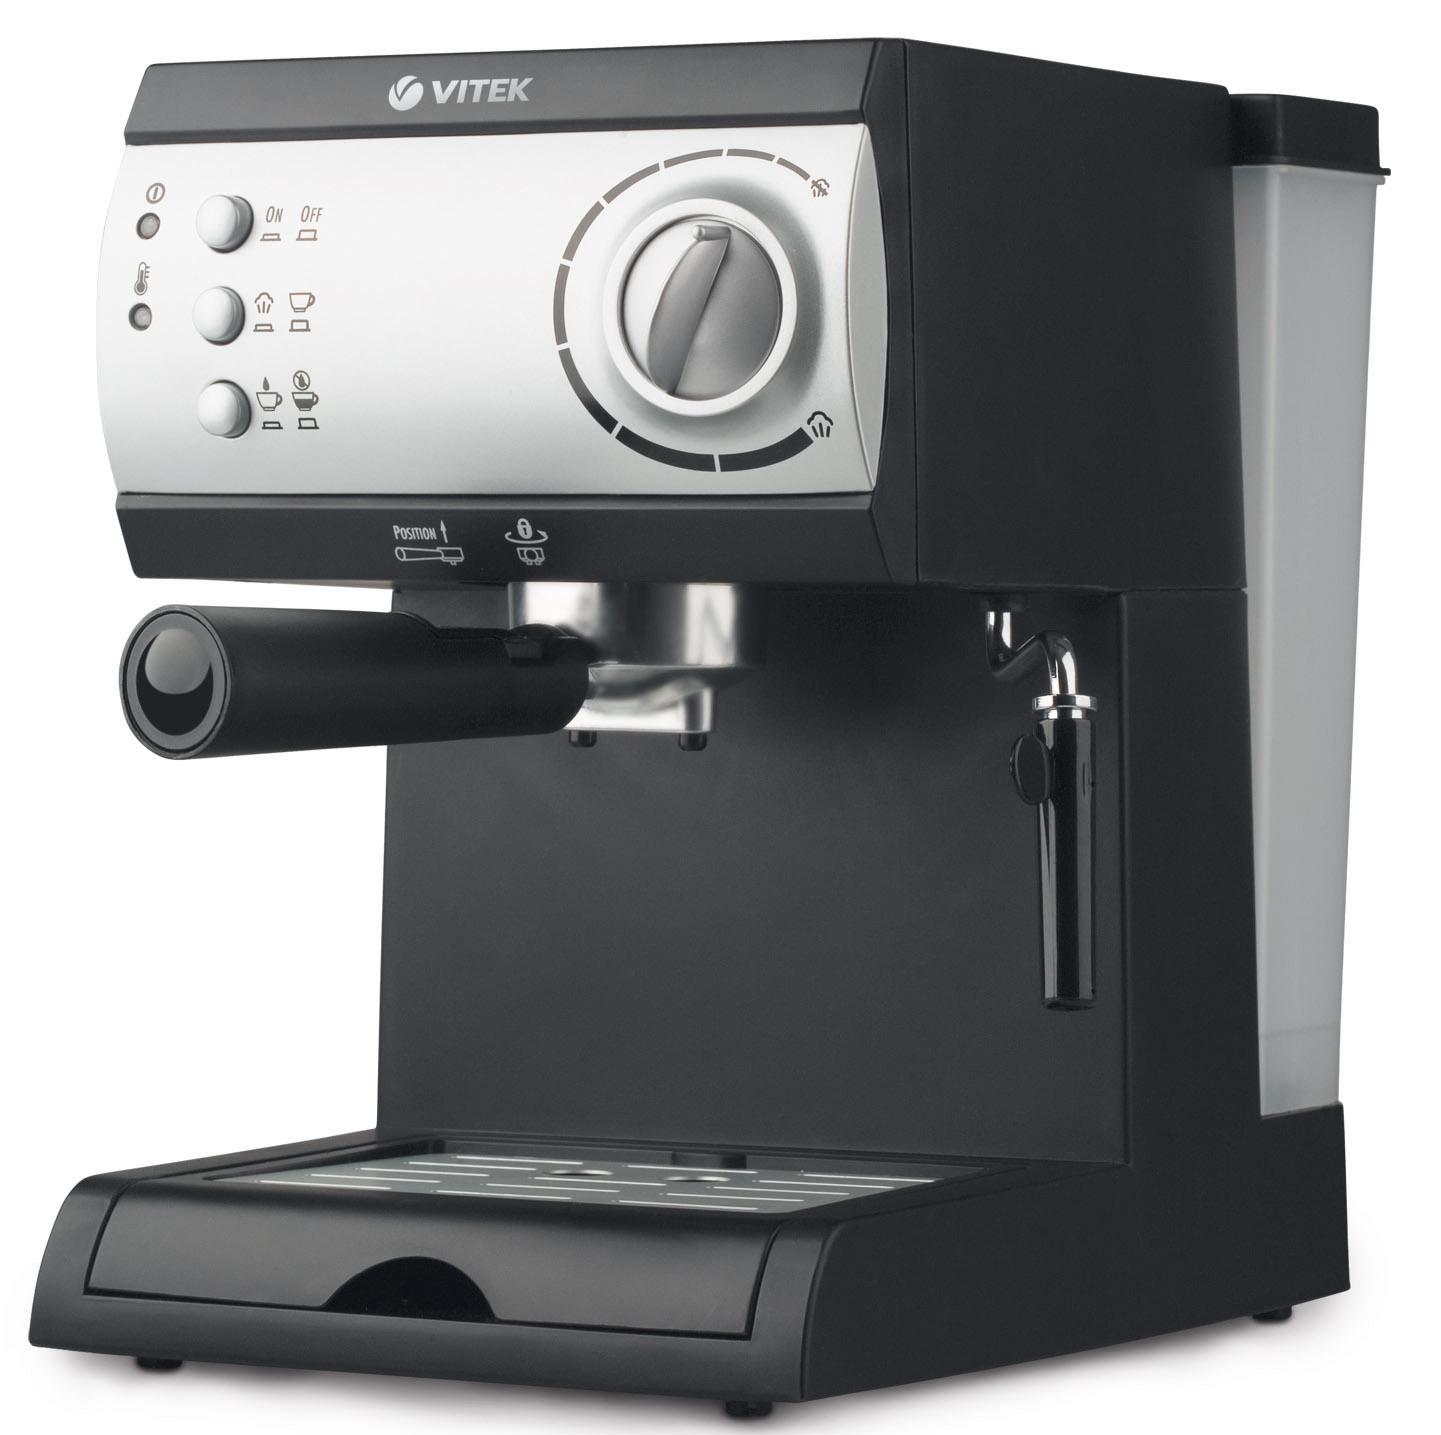 Кофеварка Vitek Vt-1511(bk) кофеварка vitek vt 1502 bk черный